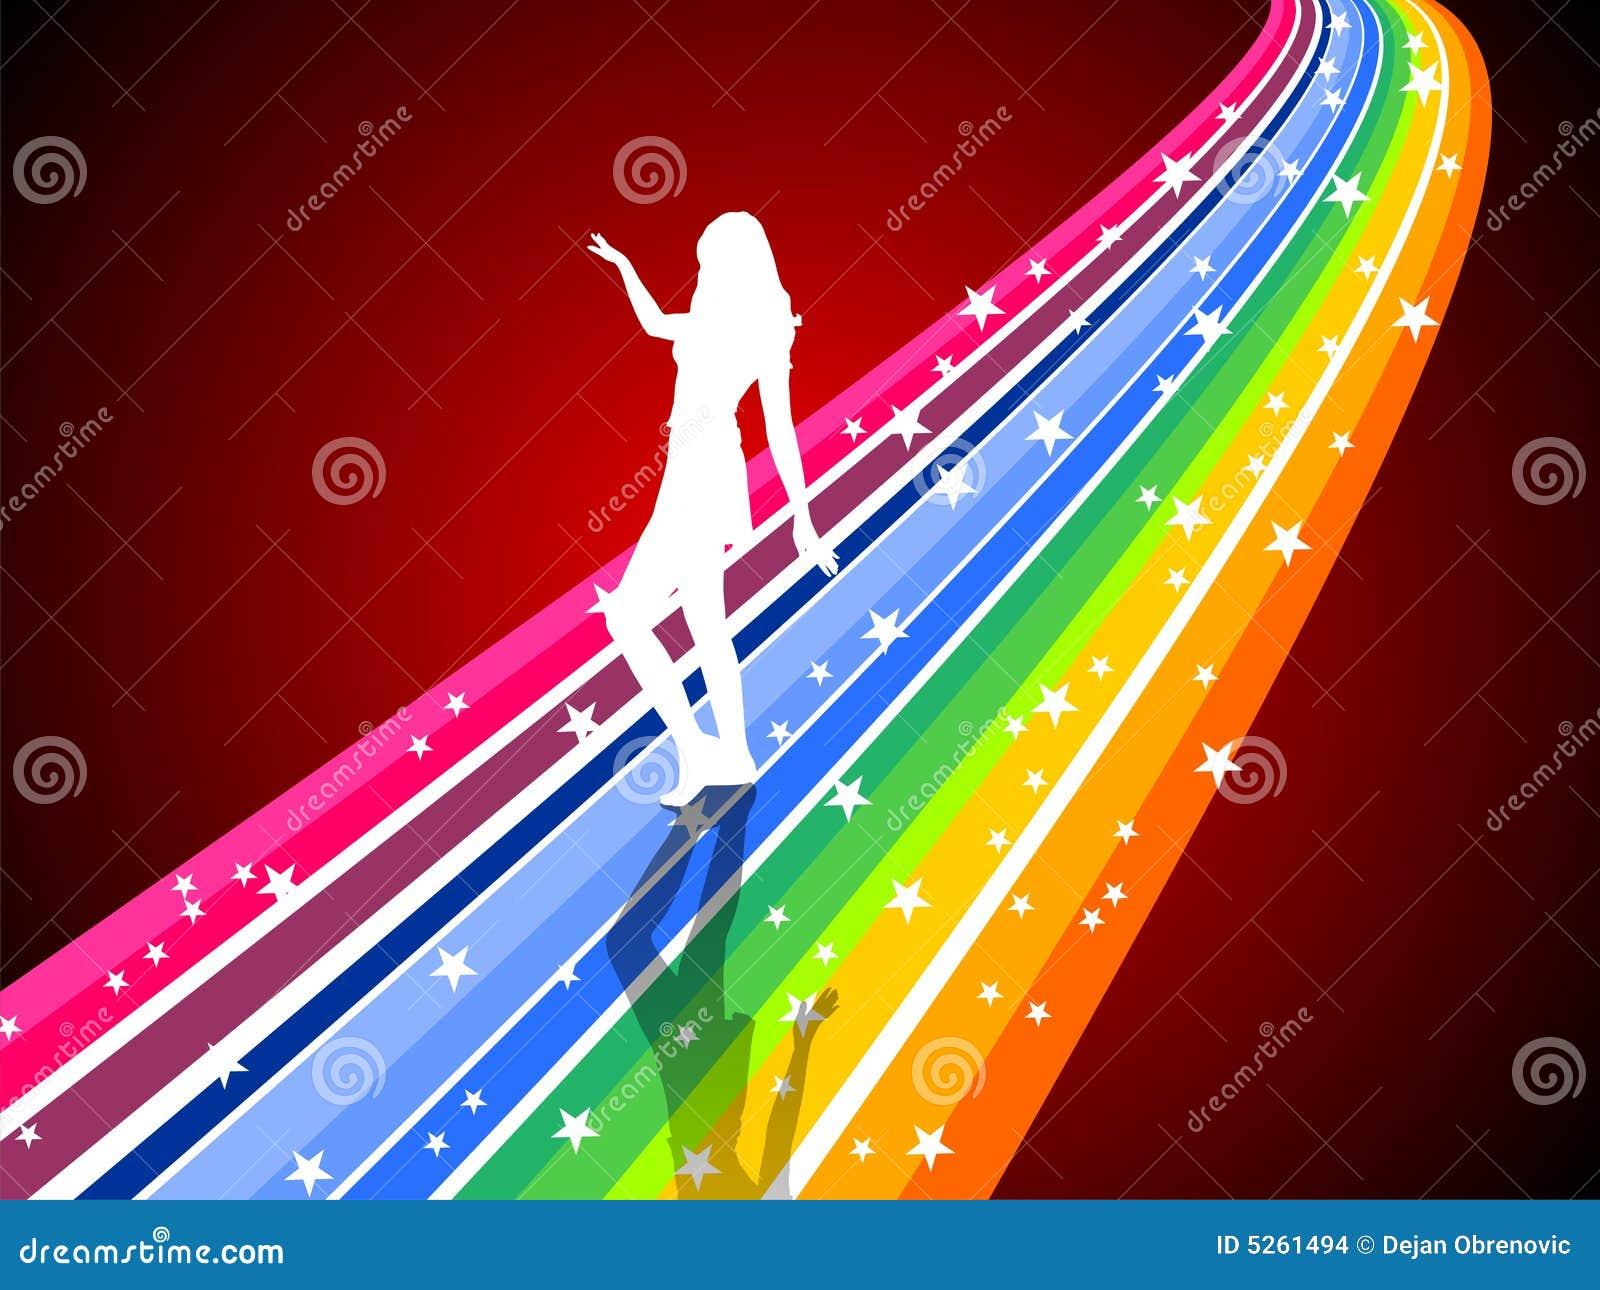 Dancing woman on a rainbow